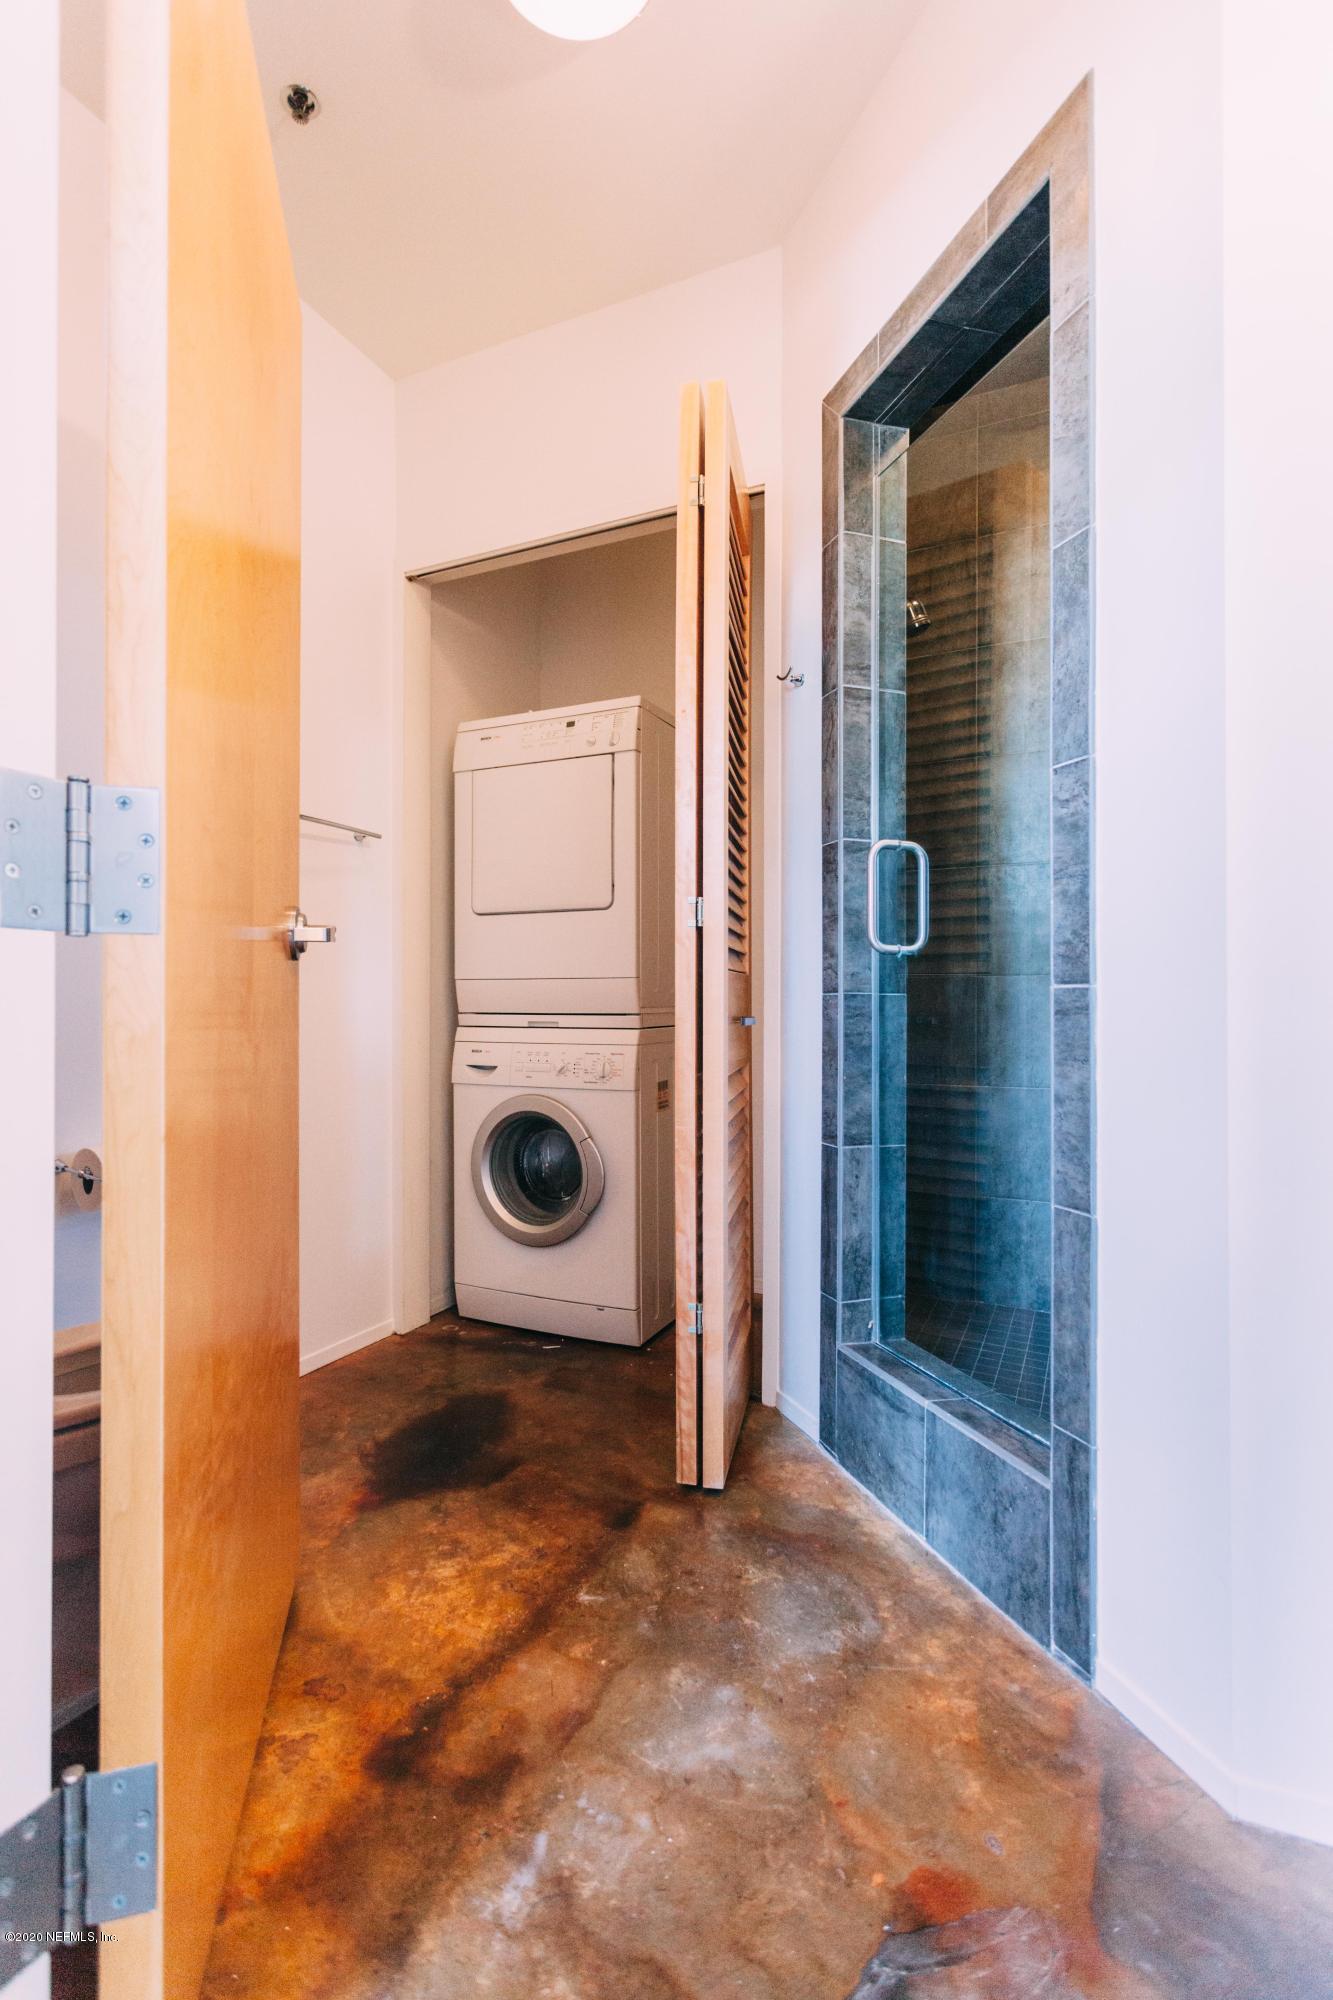 1050 HENDRICKS, JACKSONVILLE, FLORIDA 32207, 1 Bedroom Bedrooms, ,2 BathroomsBathrooms,Residential,For sale,HENDRICKS,1047338